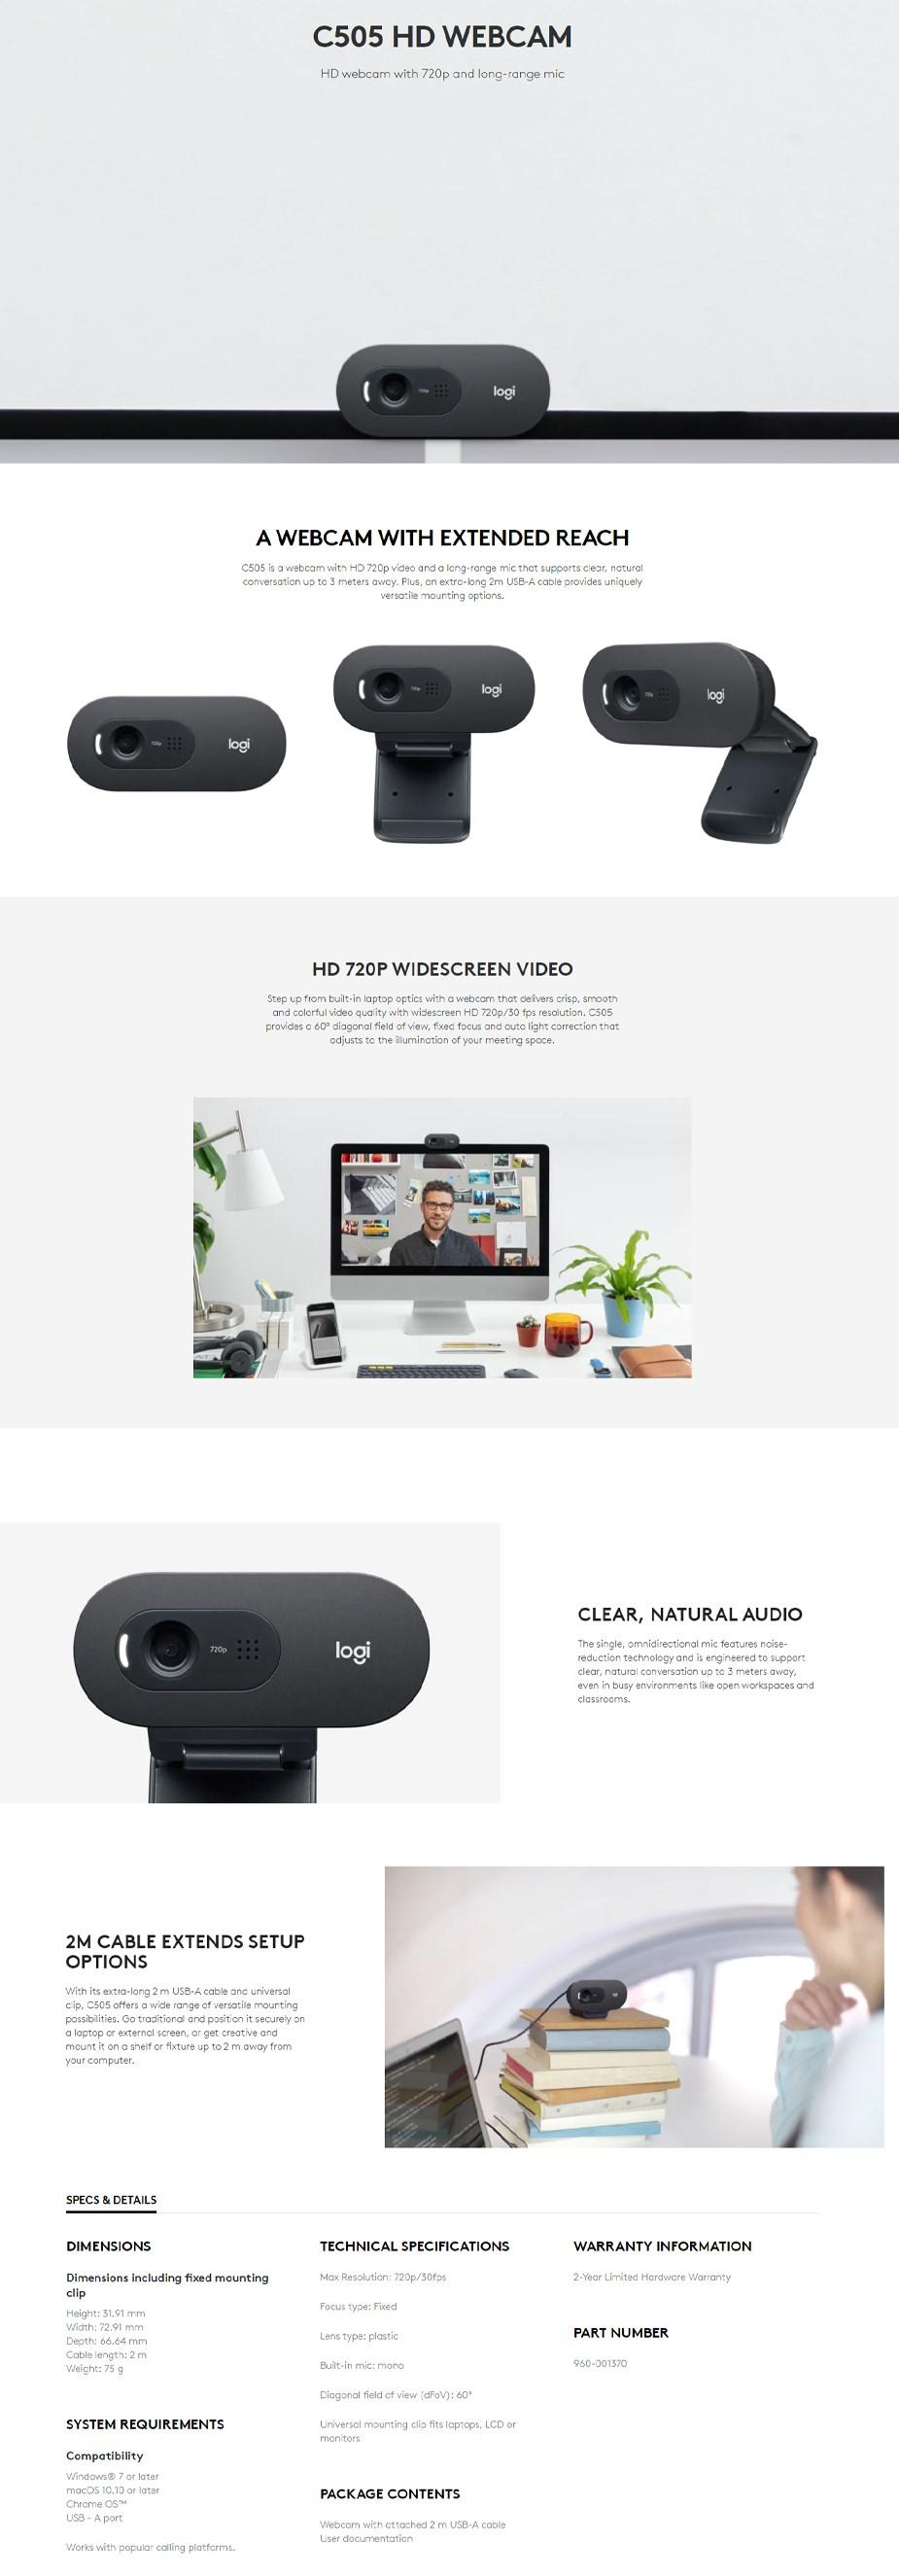 Logitech C505 HD USB Webcam - Overview 1